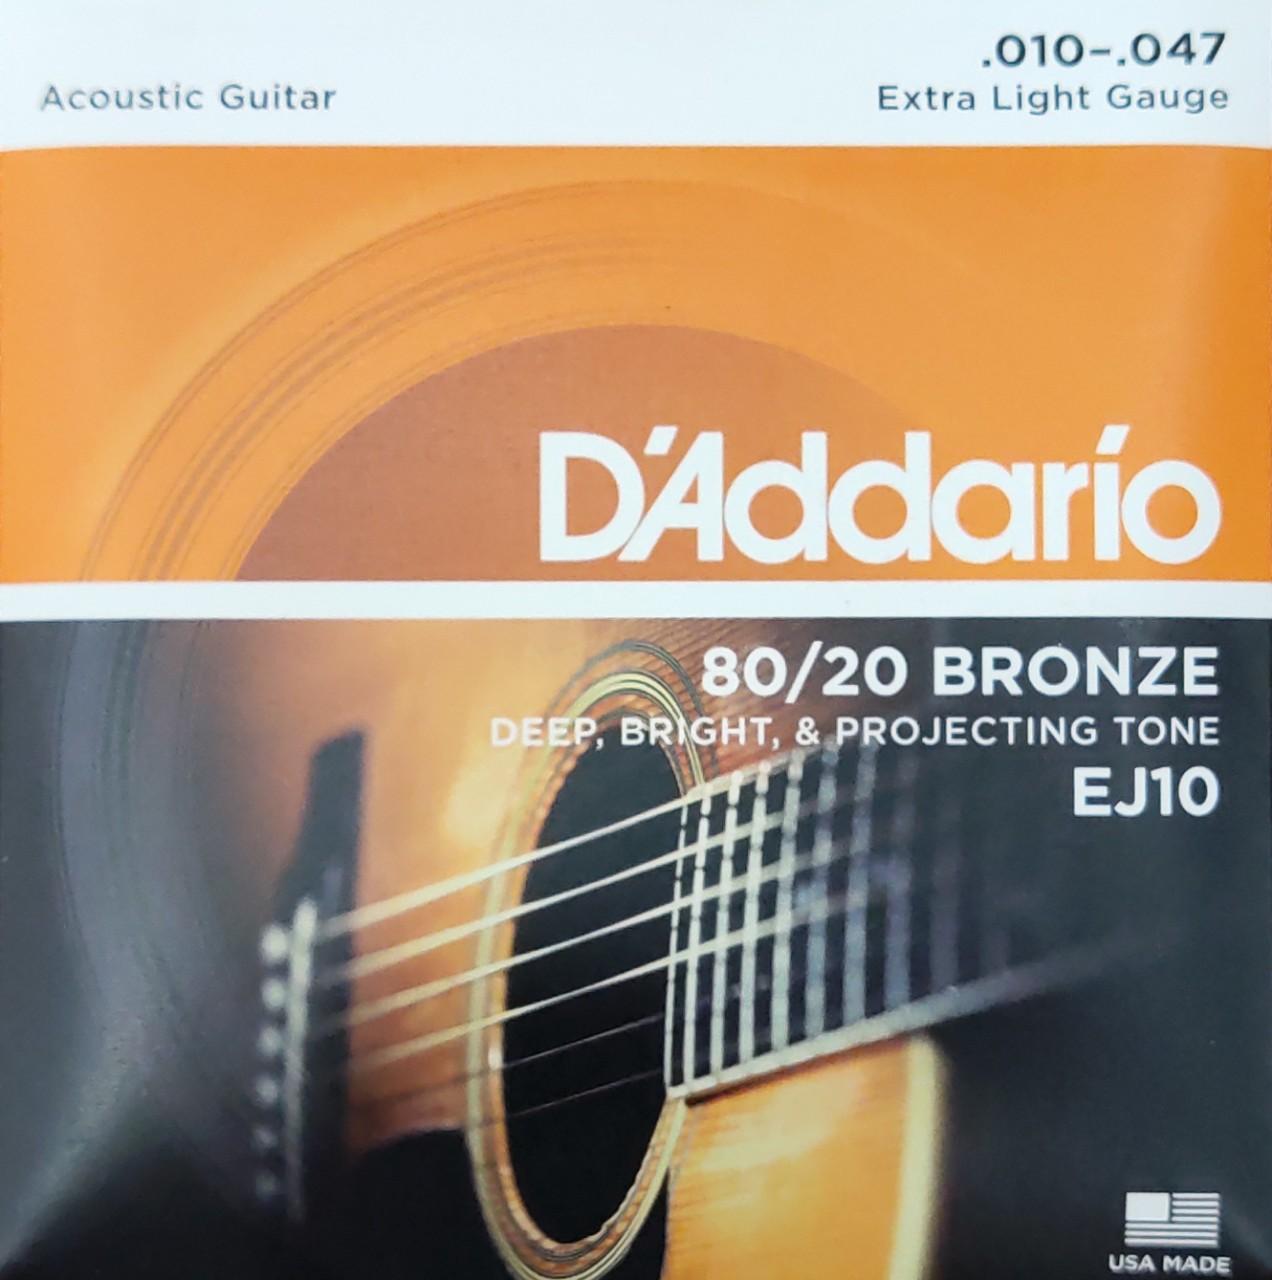 D'ADDARIO EJ10 80/20 BRONZE ACOUSTIC GUITAR STRINGS, EXTRA LIGHT, 10-47